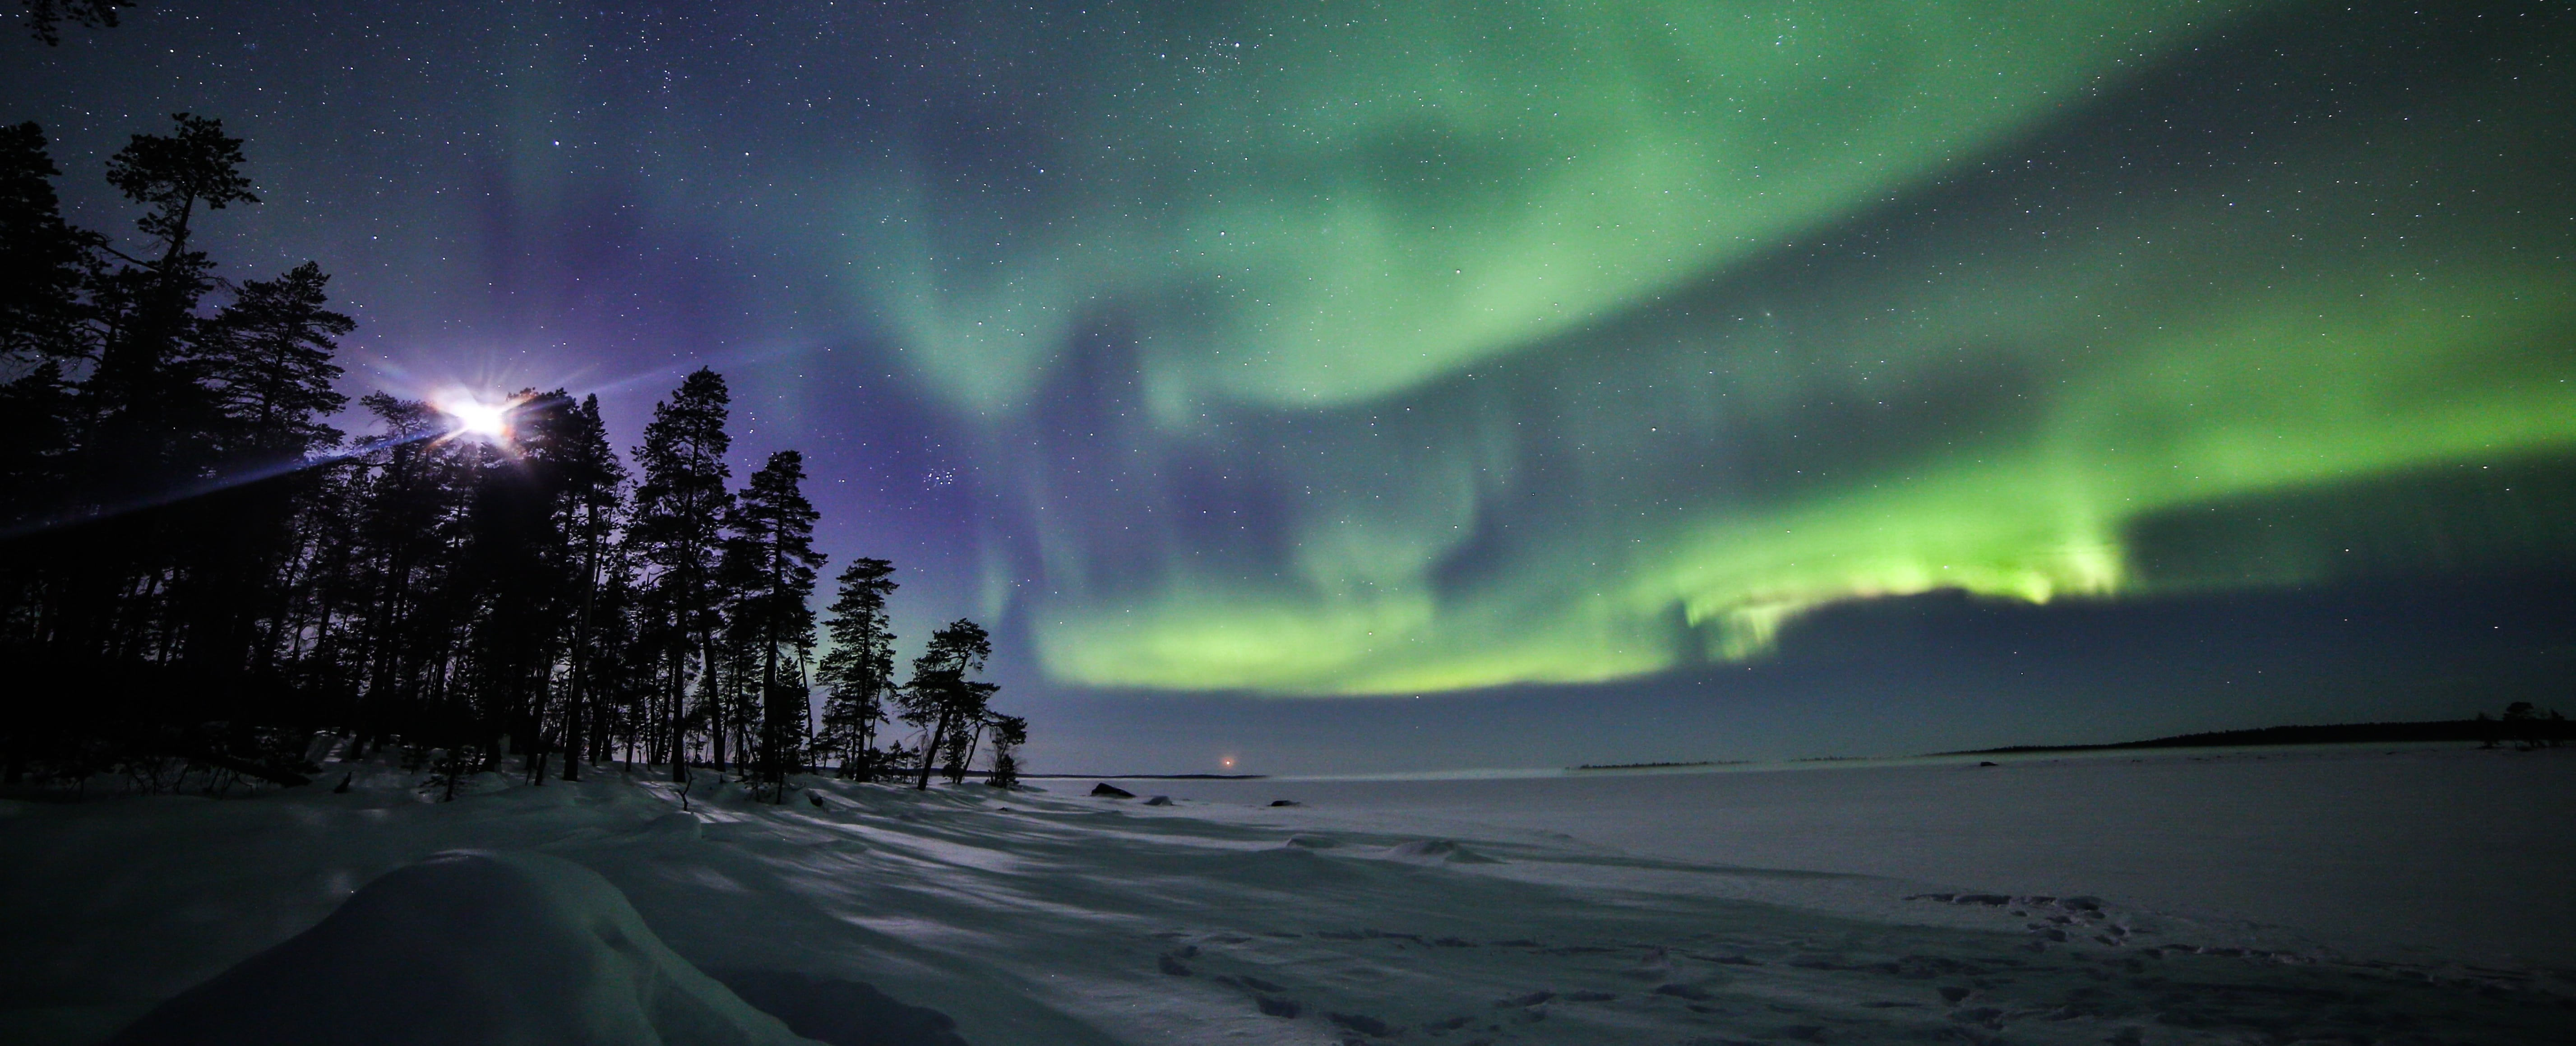 lappland finland